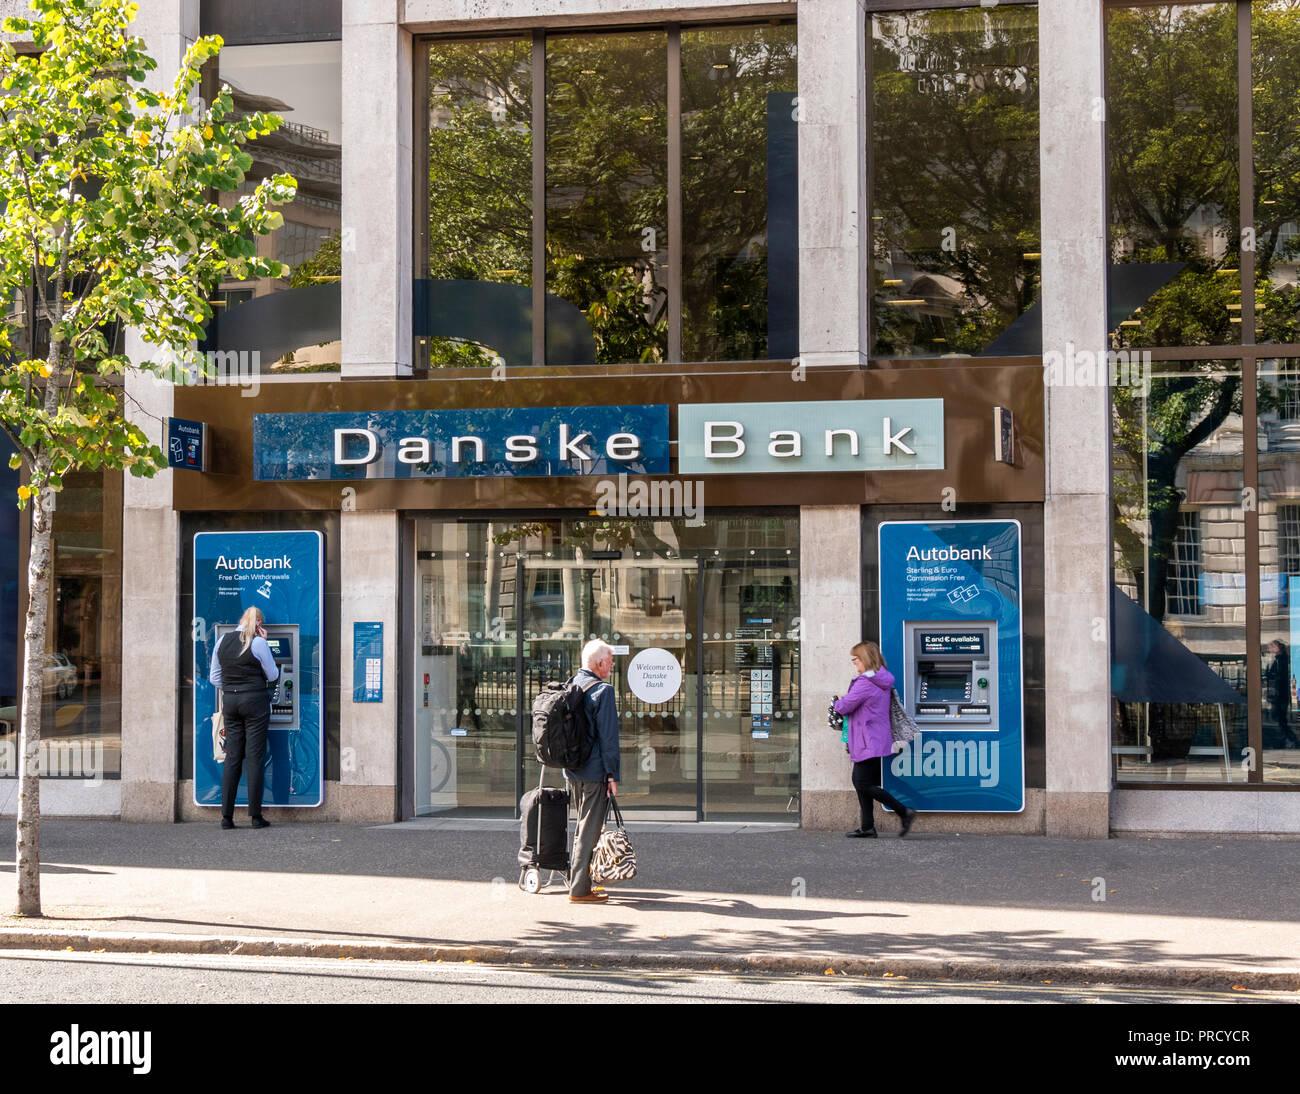 People using ATM at Danske Bank, Donegall Square West Belfast - Stock Image